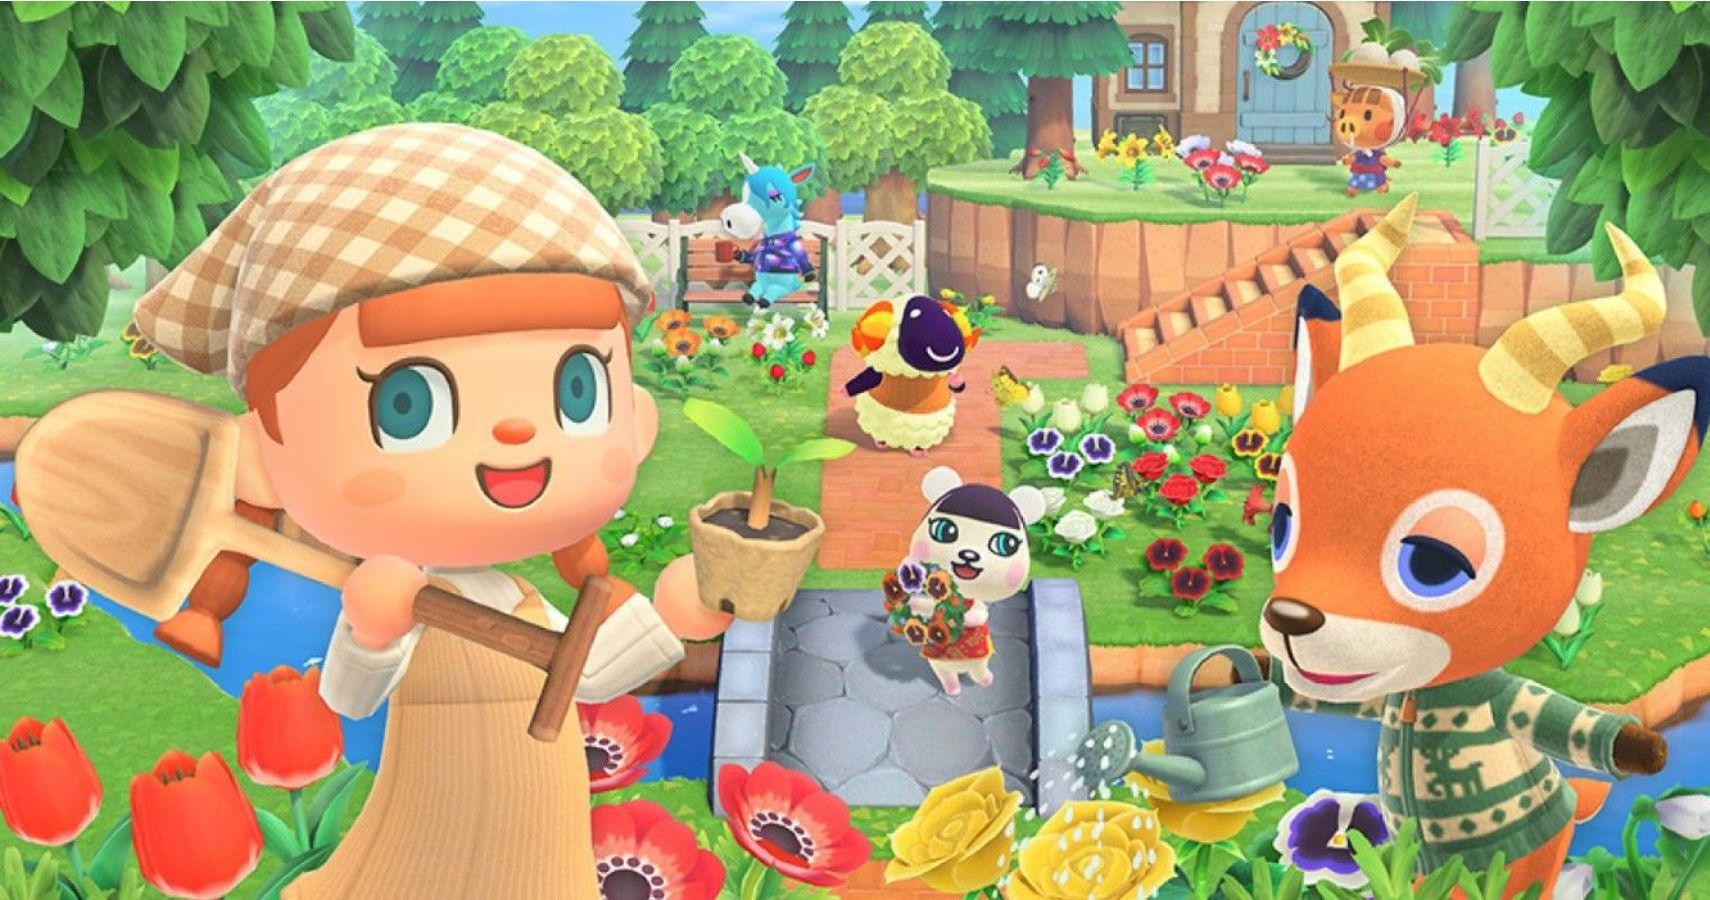 Early Animal Crossing: New Horizons Beta Screenshots Show ...